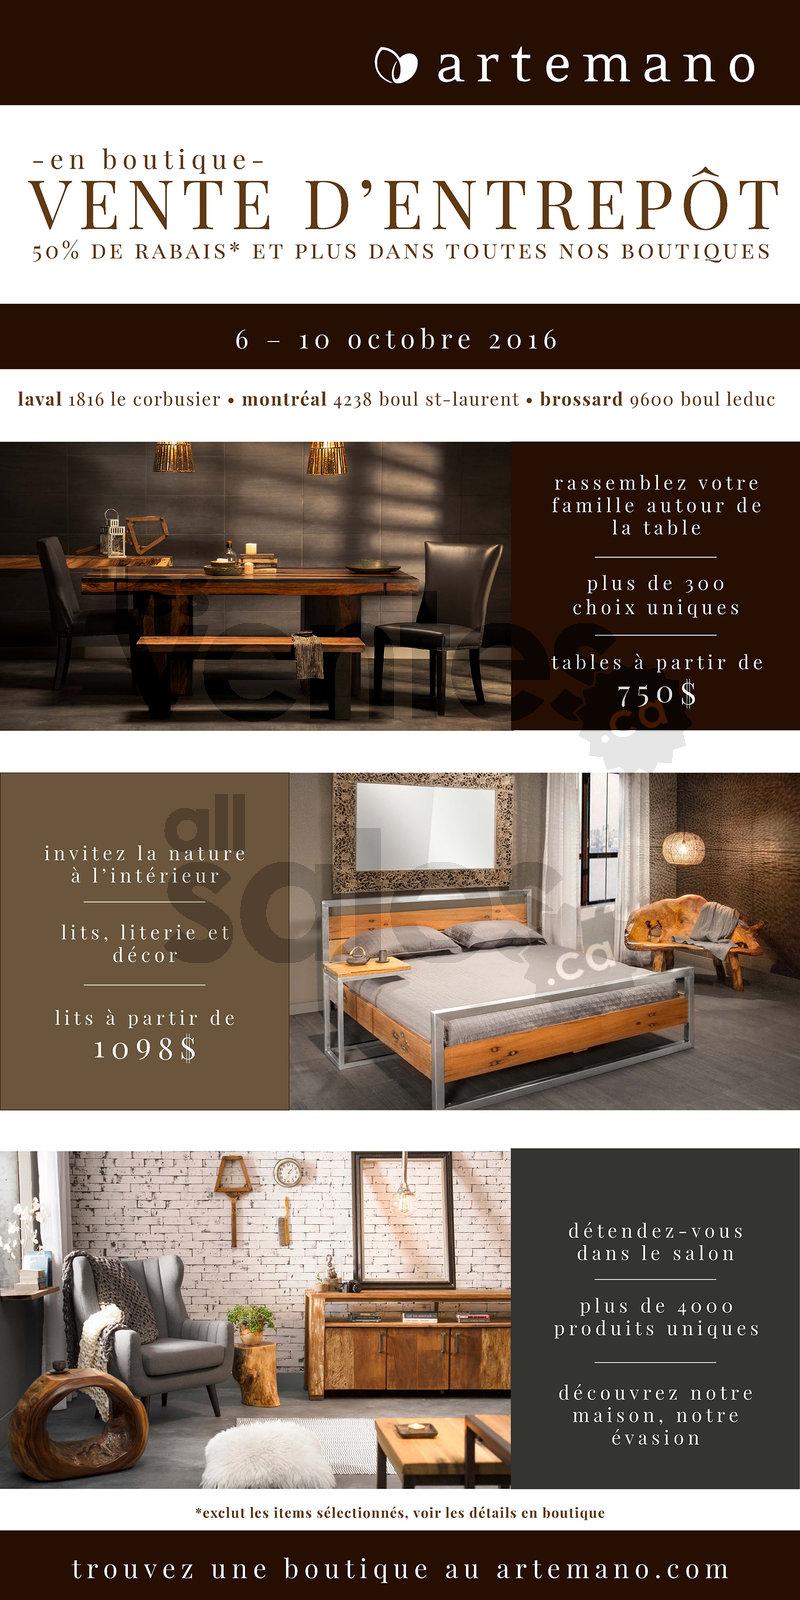 vente d 39 entrep t artemano rabais 50. Black Bedroom Furniture Sets. Home Design Ideas